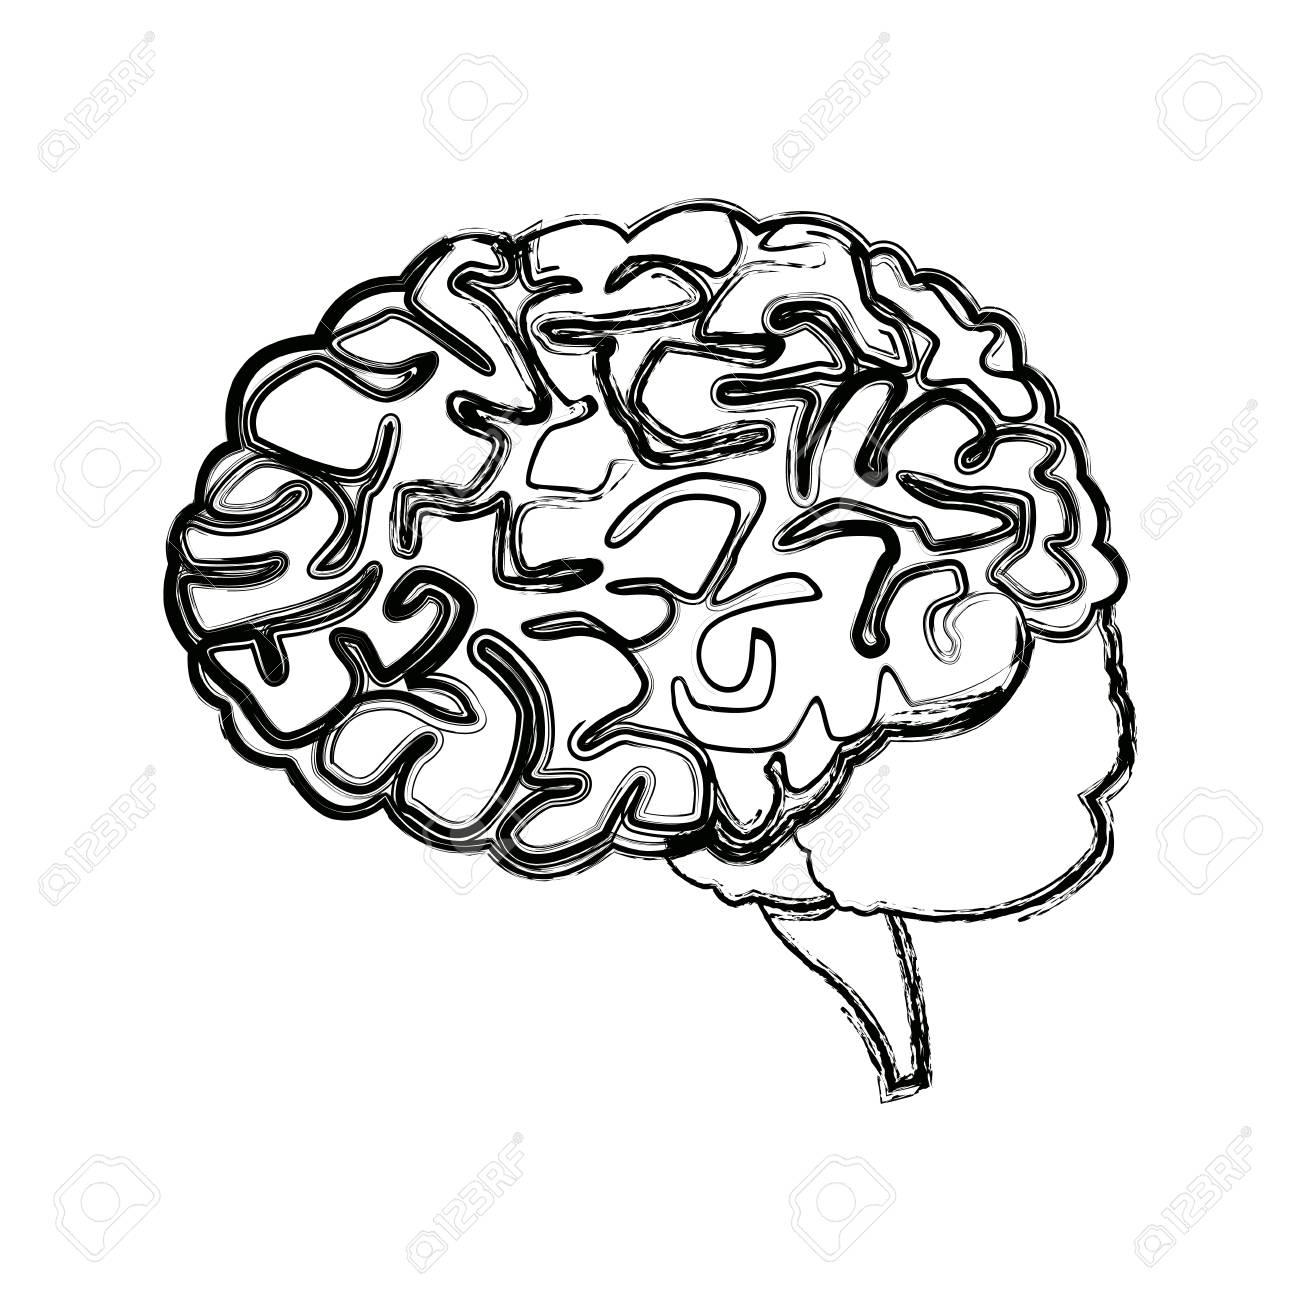 1300x1300 Human Brain For Medical Healthy Memory Anatomy Design Vector